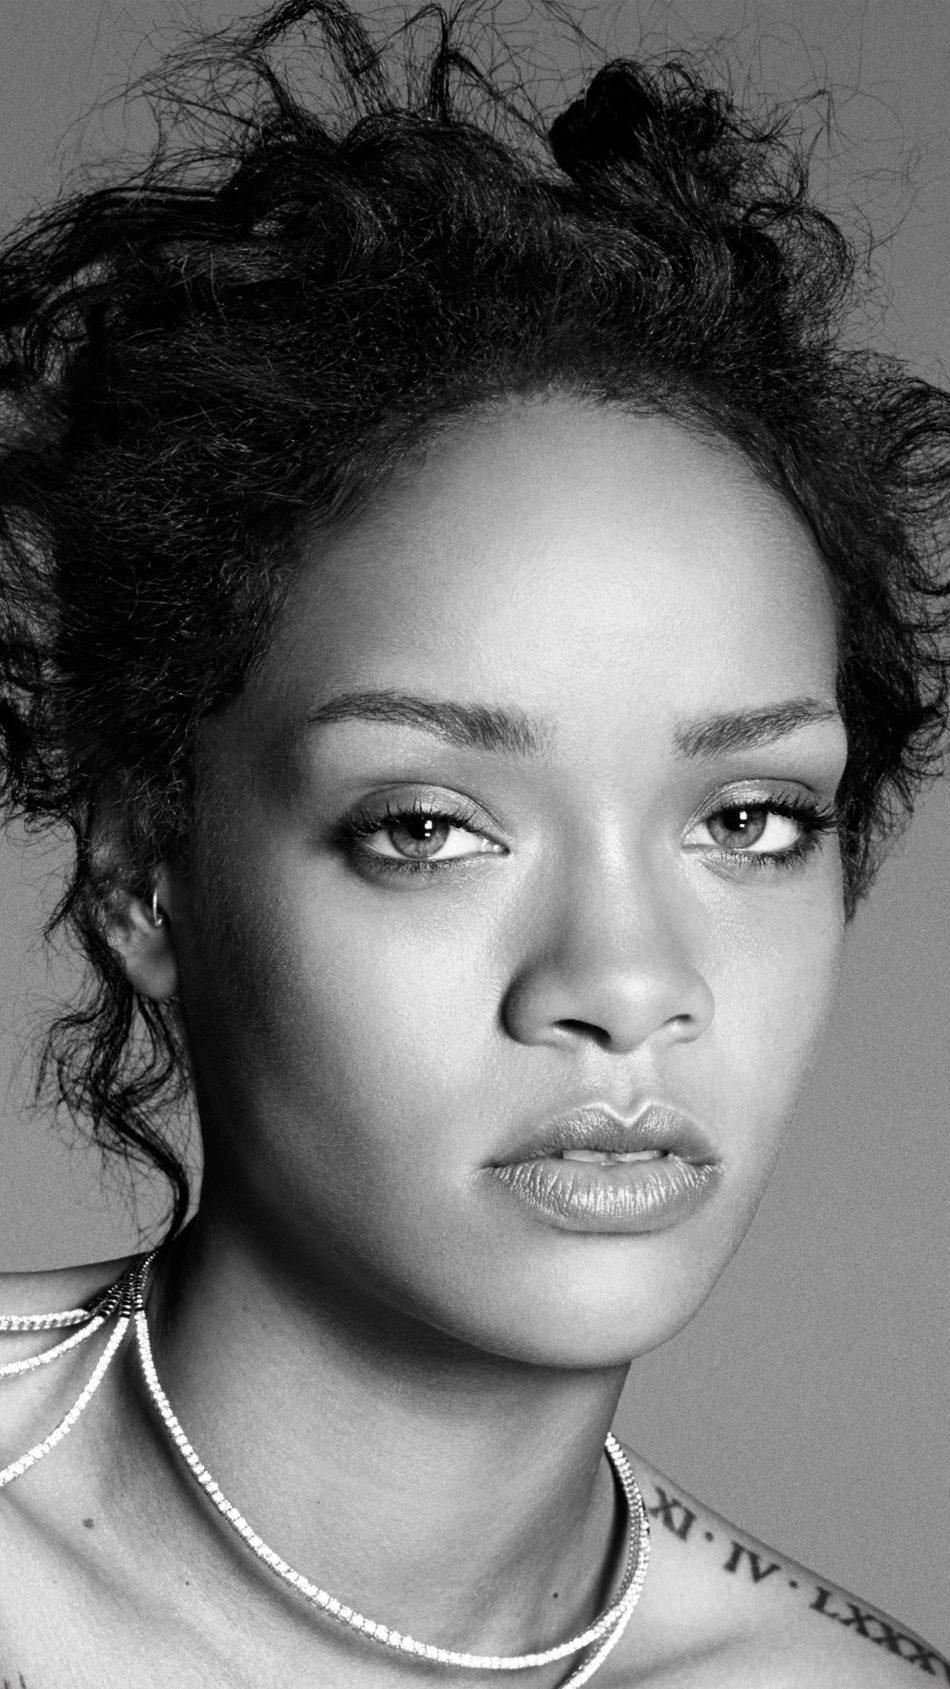 Rihanna Monochrome 2018 4K Ultra HD Mobile Wallpaper